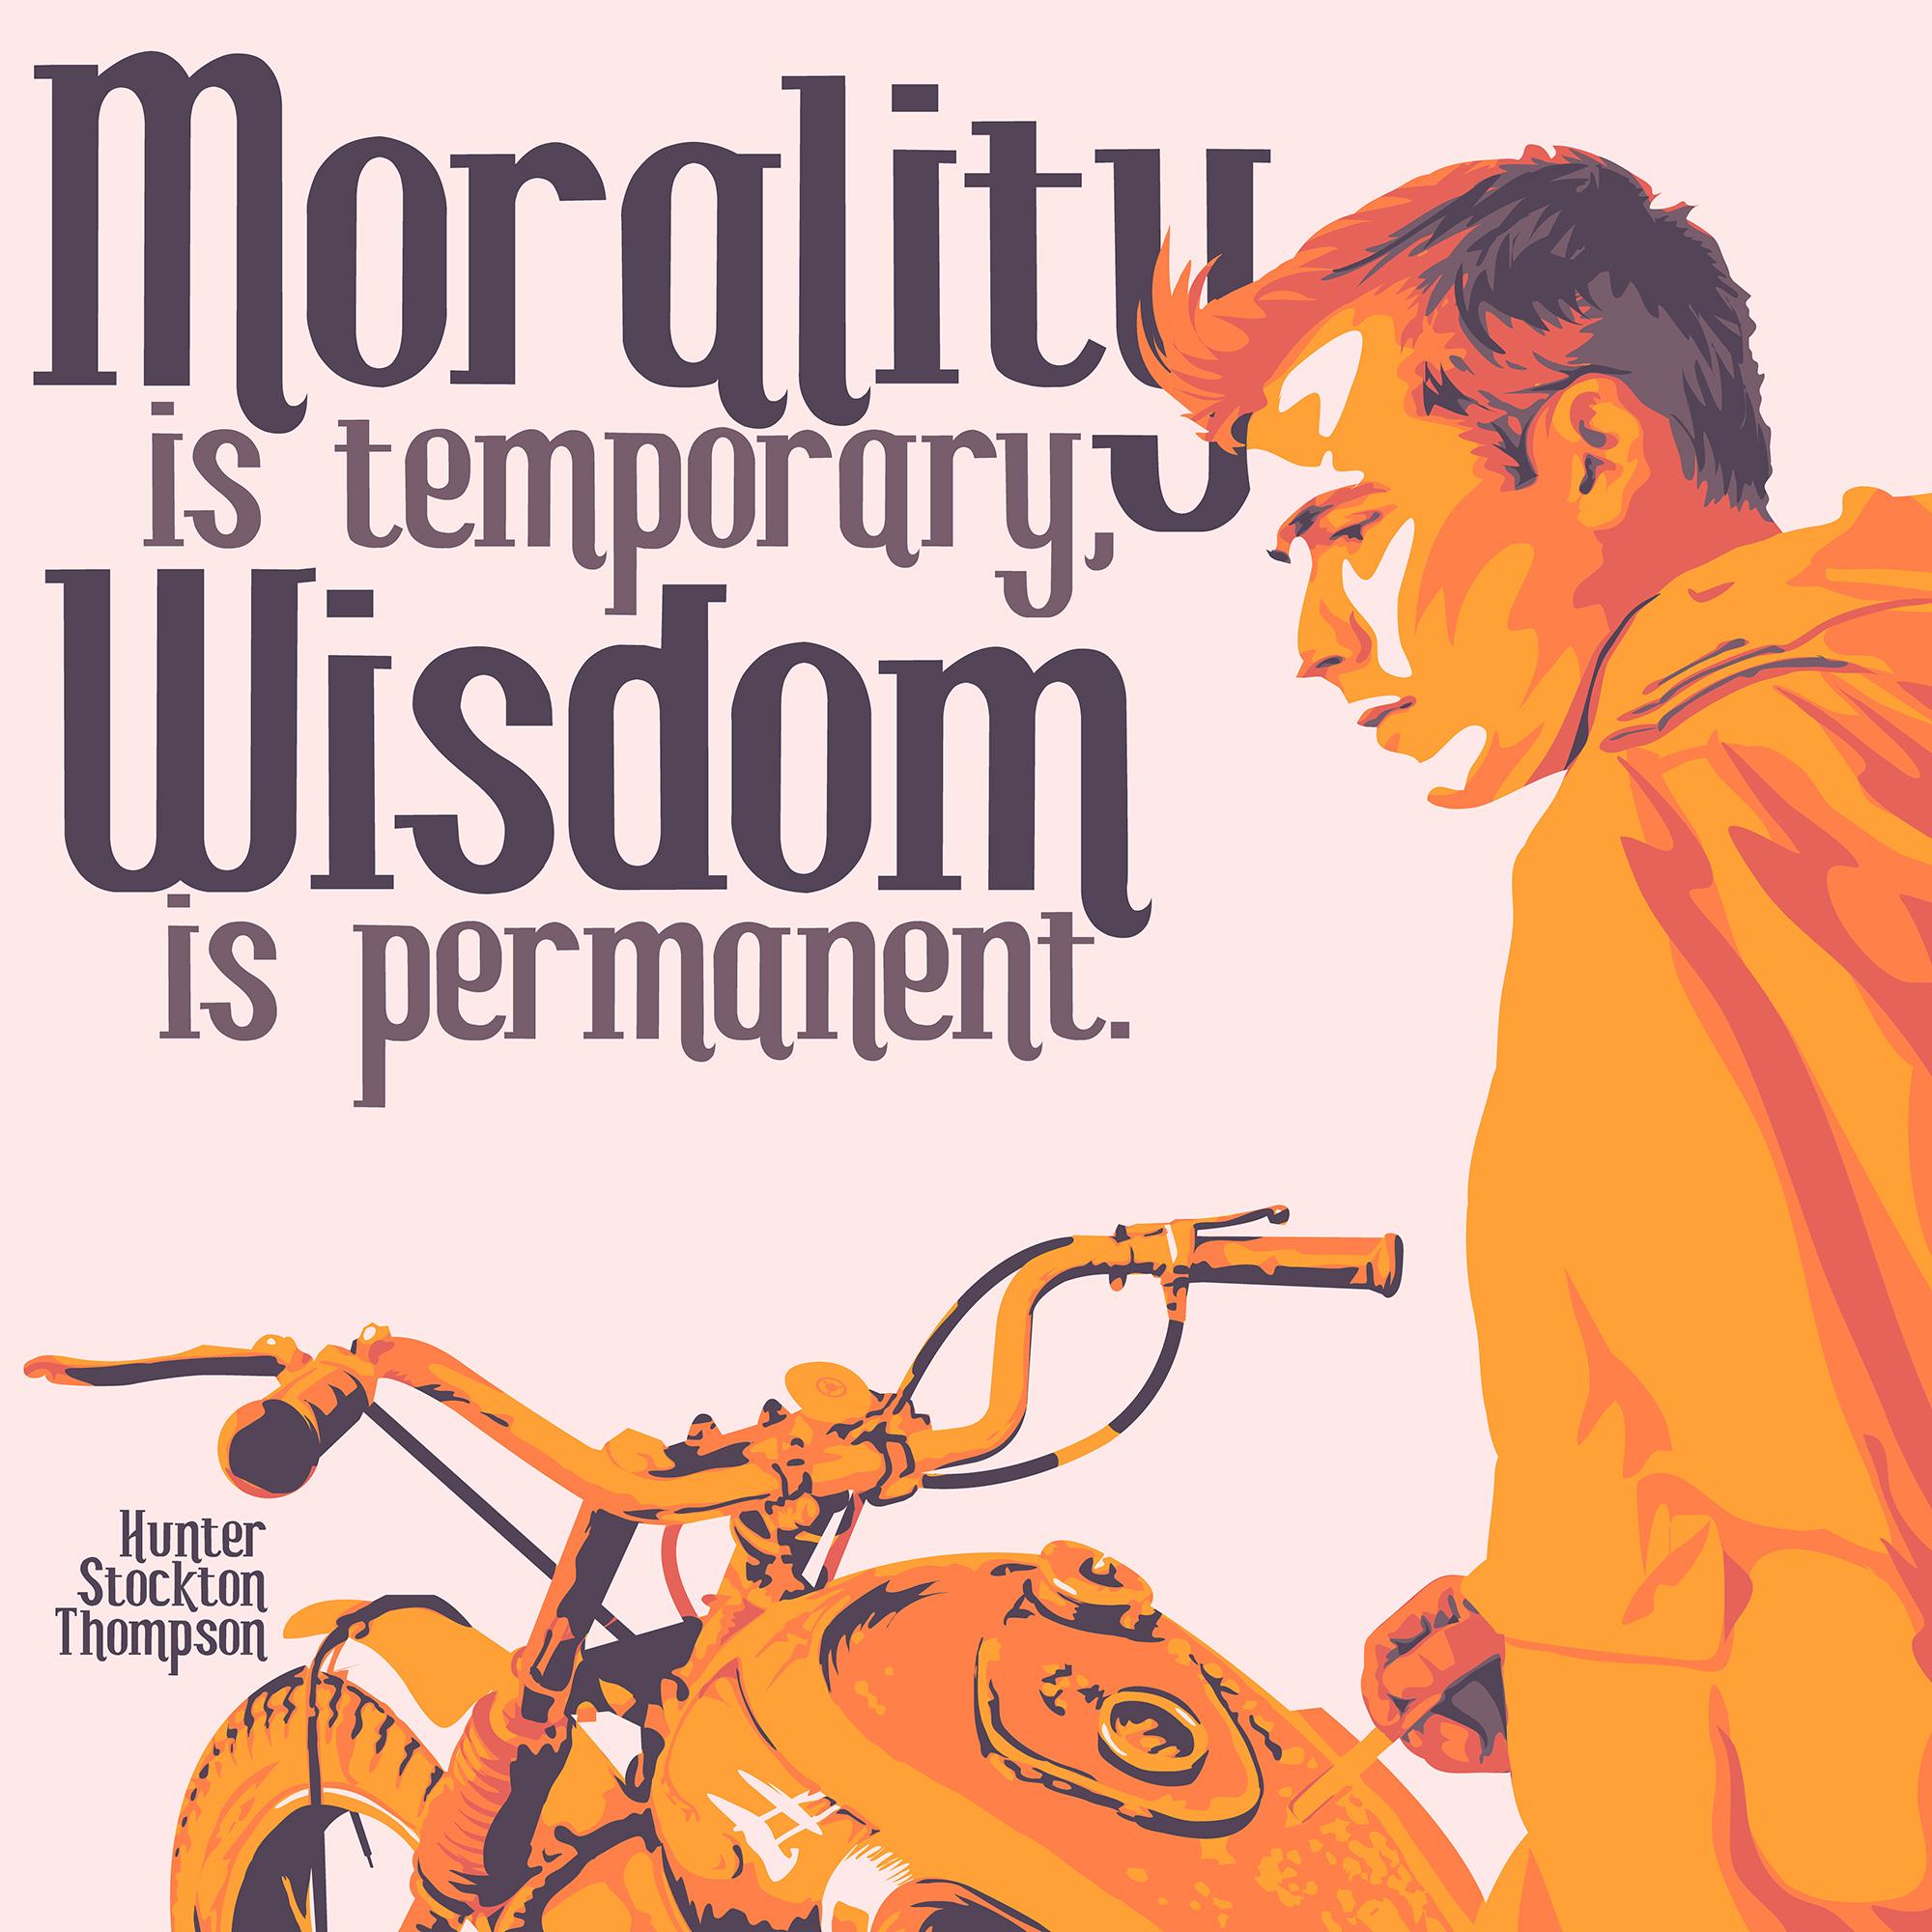 """Morality is temporary. Wisdom is permanent."" – Hunter Stockton Thompson [2000×2000] [OC] [OS]"